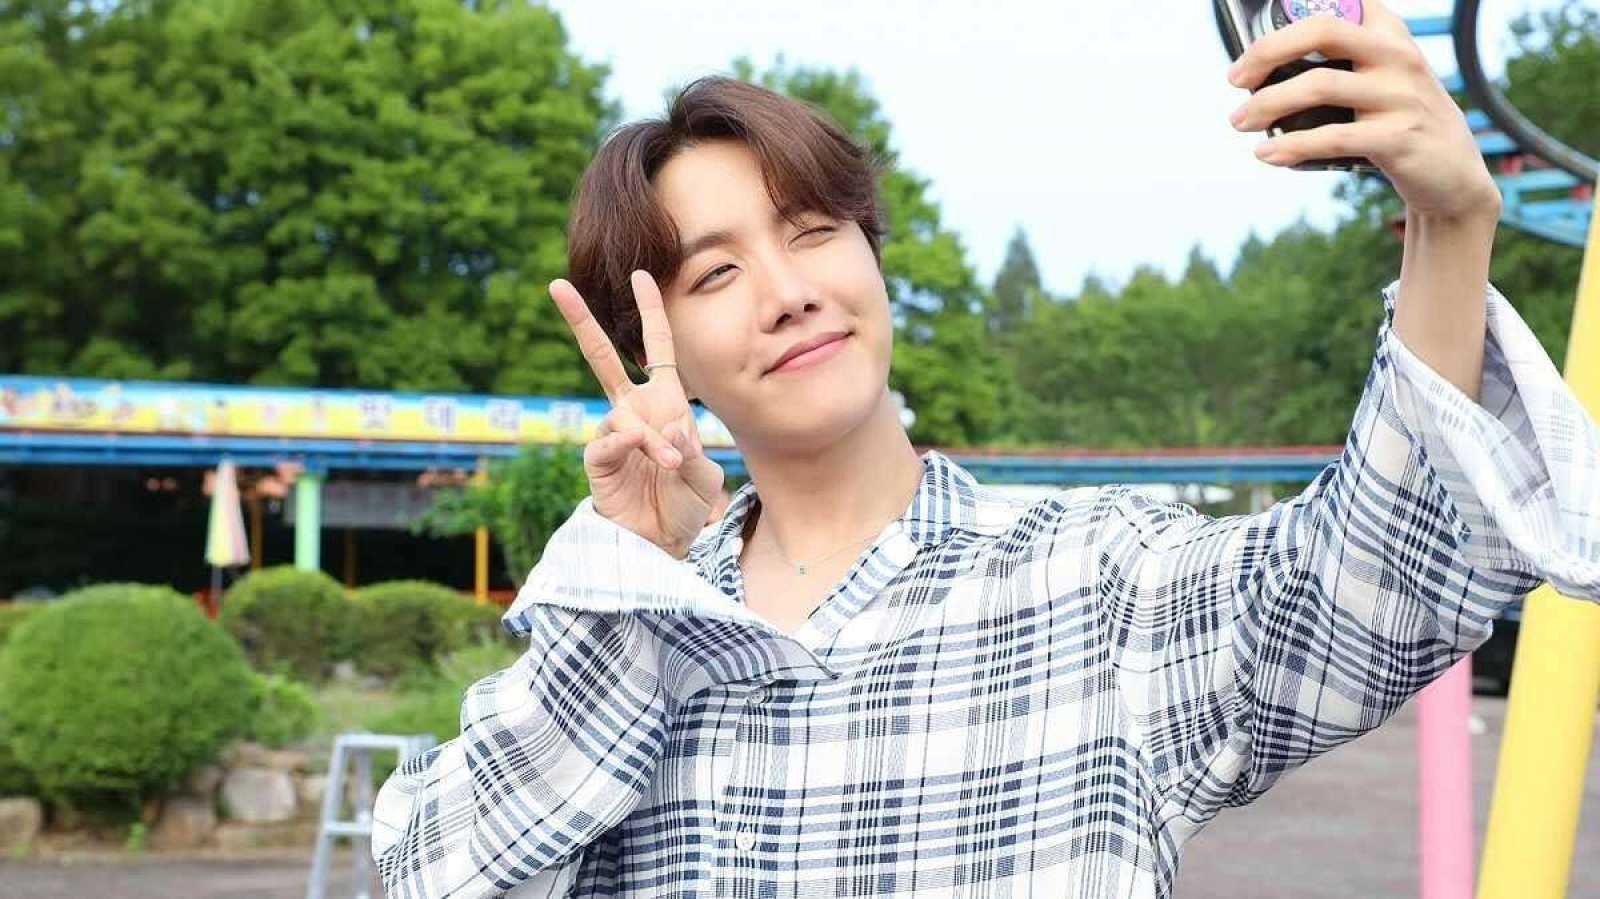 JHope de BTS cumple 26 años